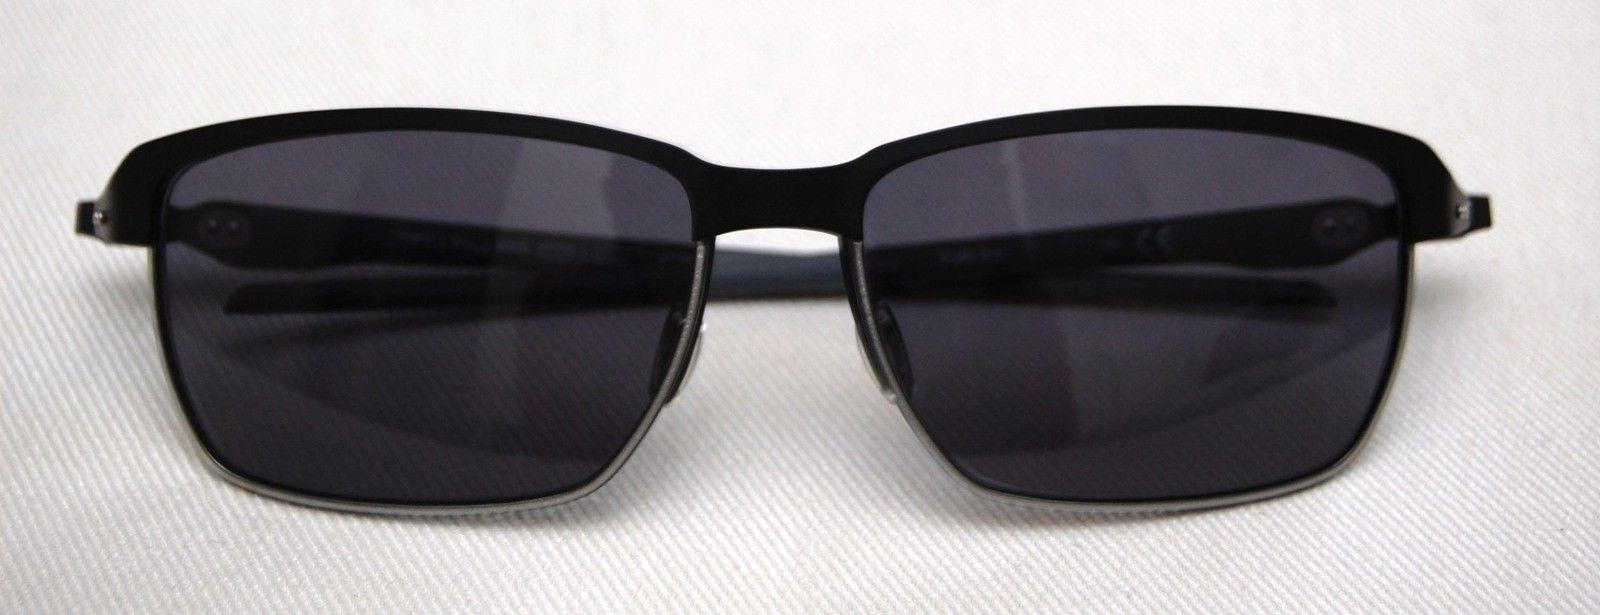 Tinfoil Carbon OO6018-01 Matte Black / Silver | Grey Lens - 05.jpg